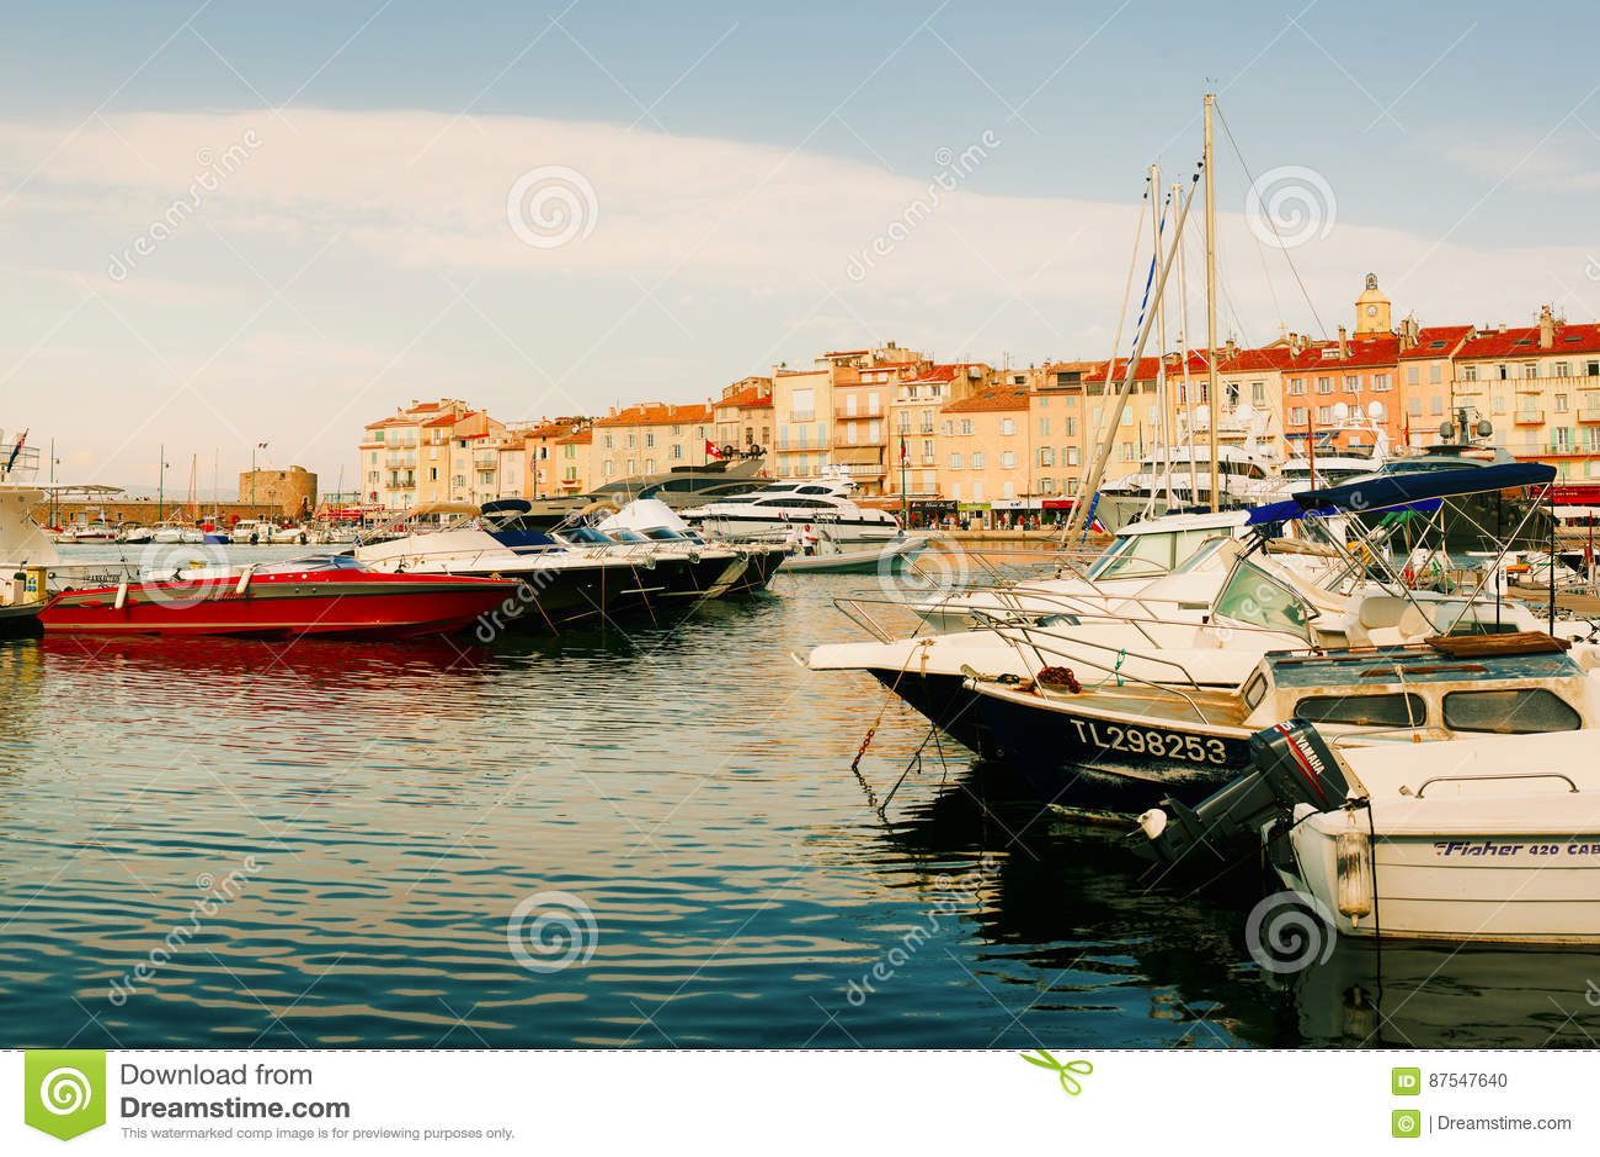 Luxury Yachts in Saint-Tropez